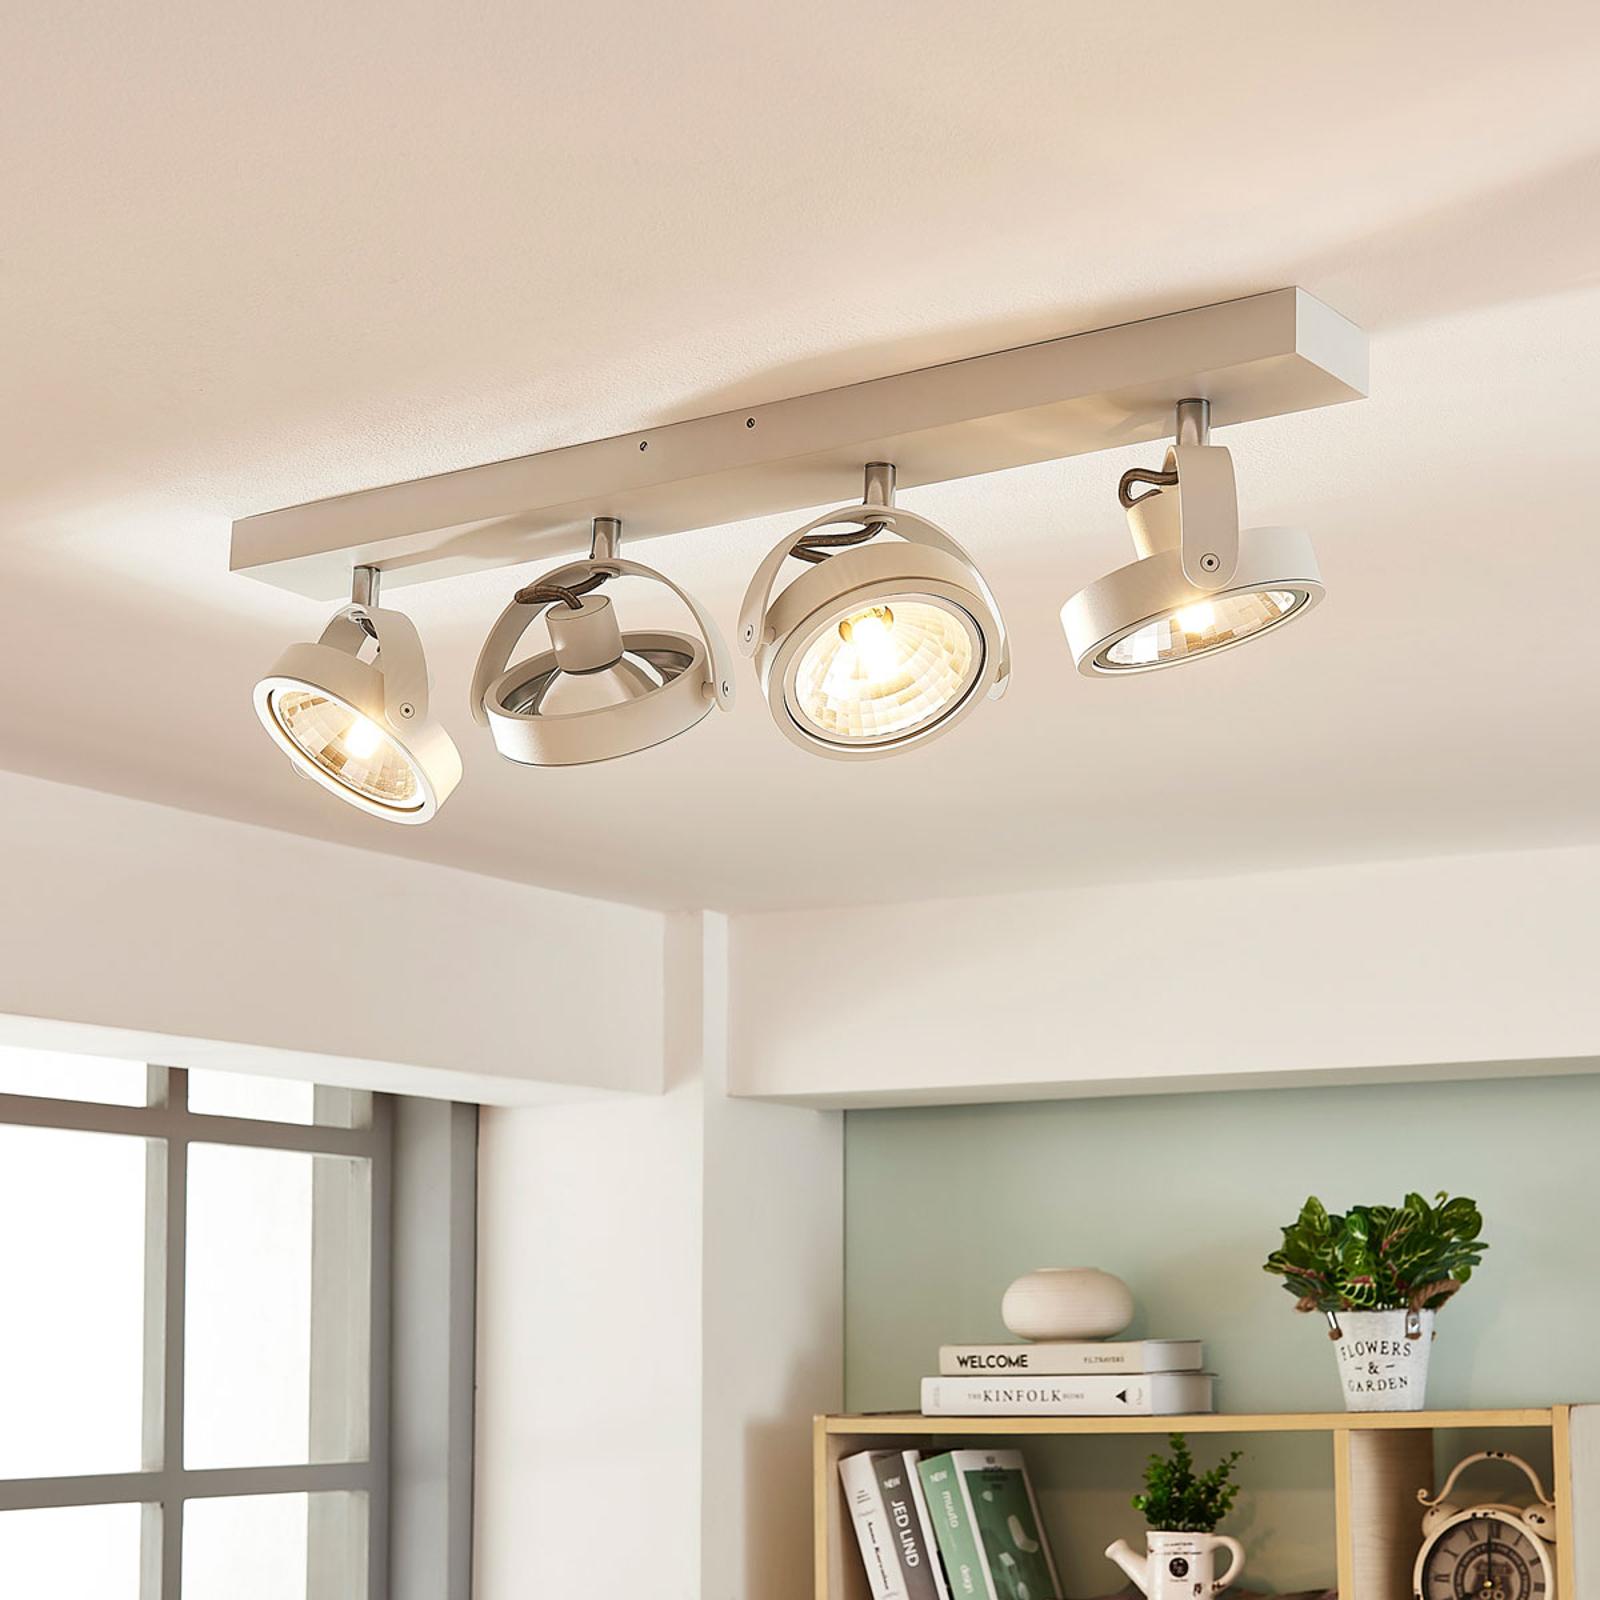 Podłużna lampa sufitowa LED Lieven, 4-punktowa